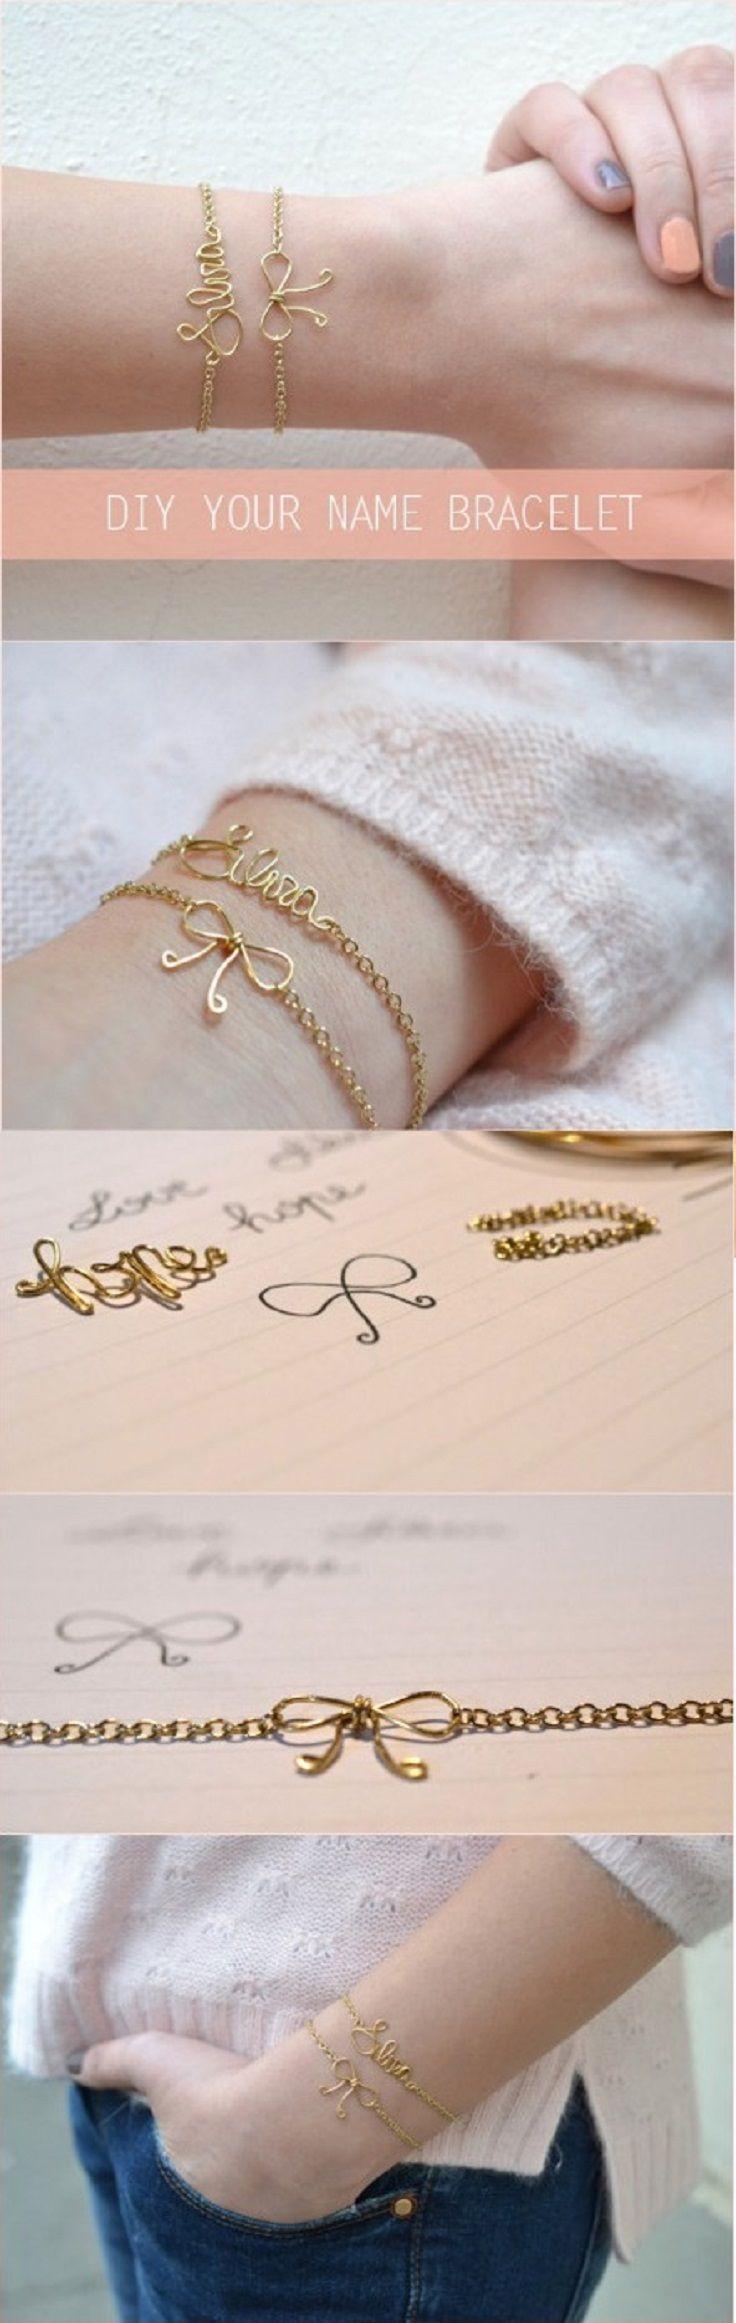 33598-Diy-Your-Name-Bracelet